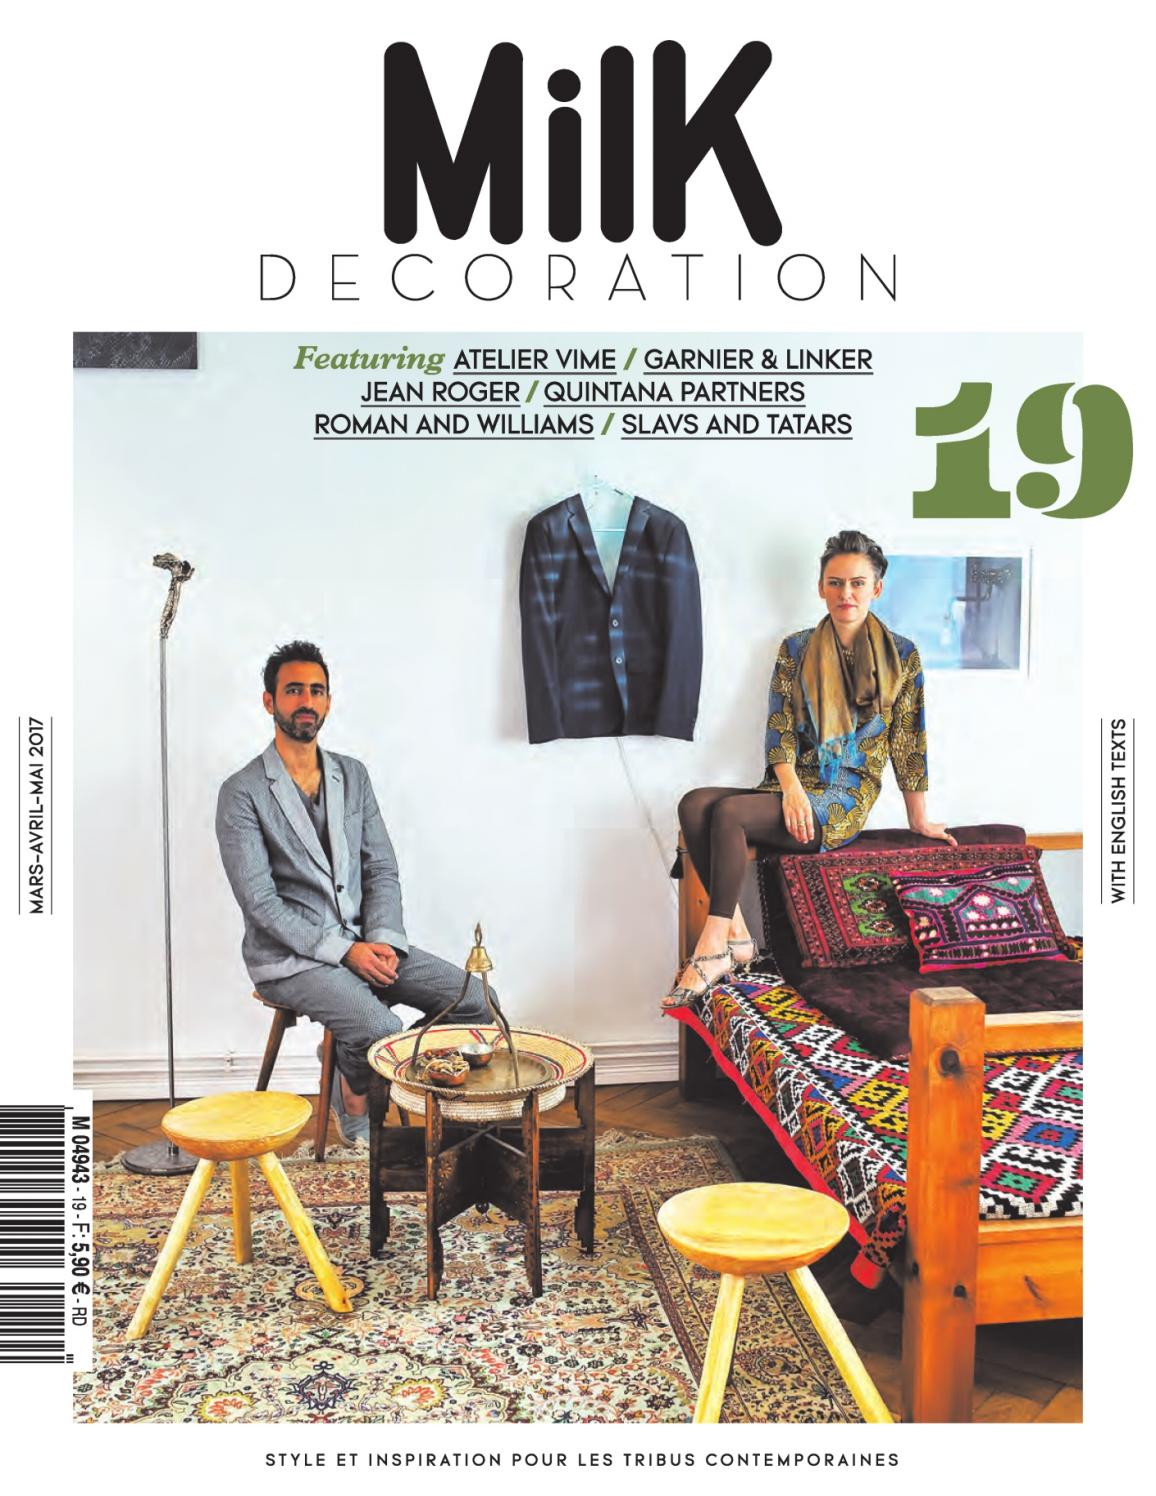 Milk Decoration cover